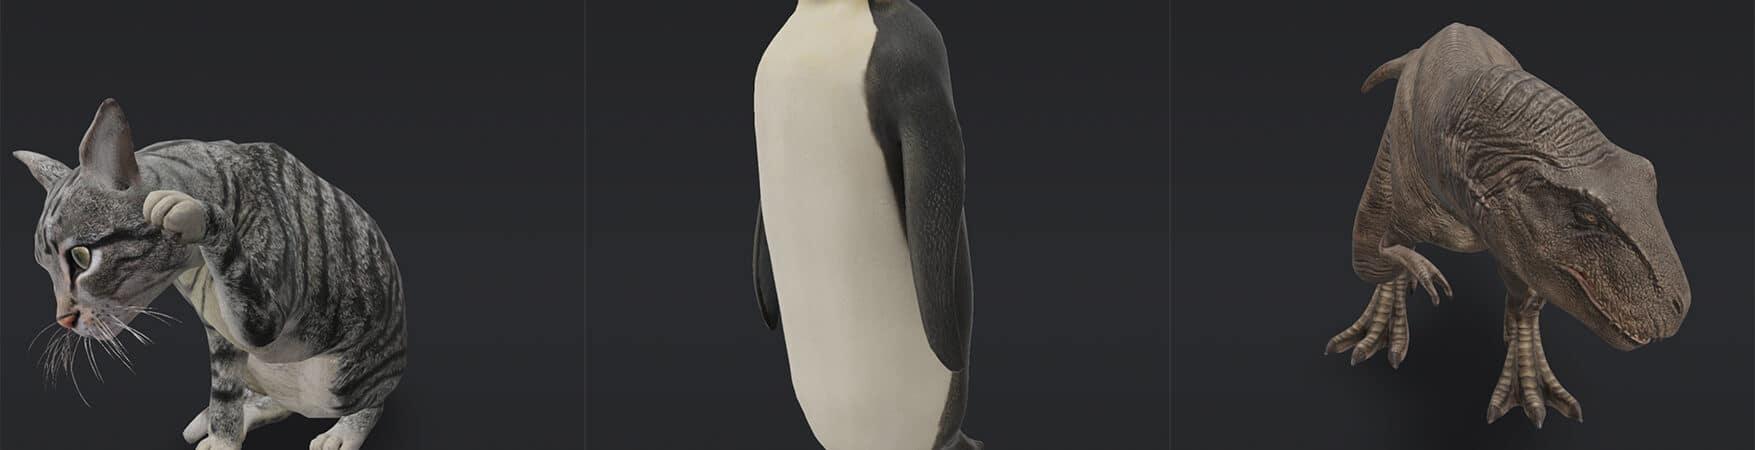 google-animais-3d-1755x450